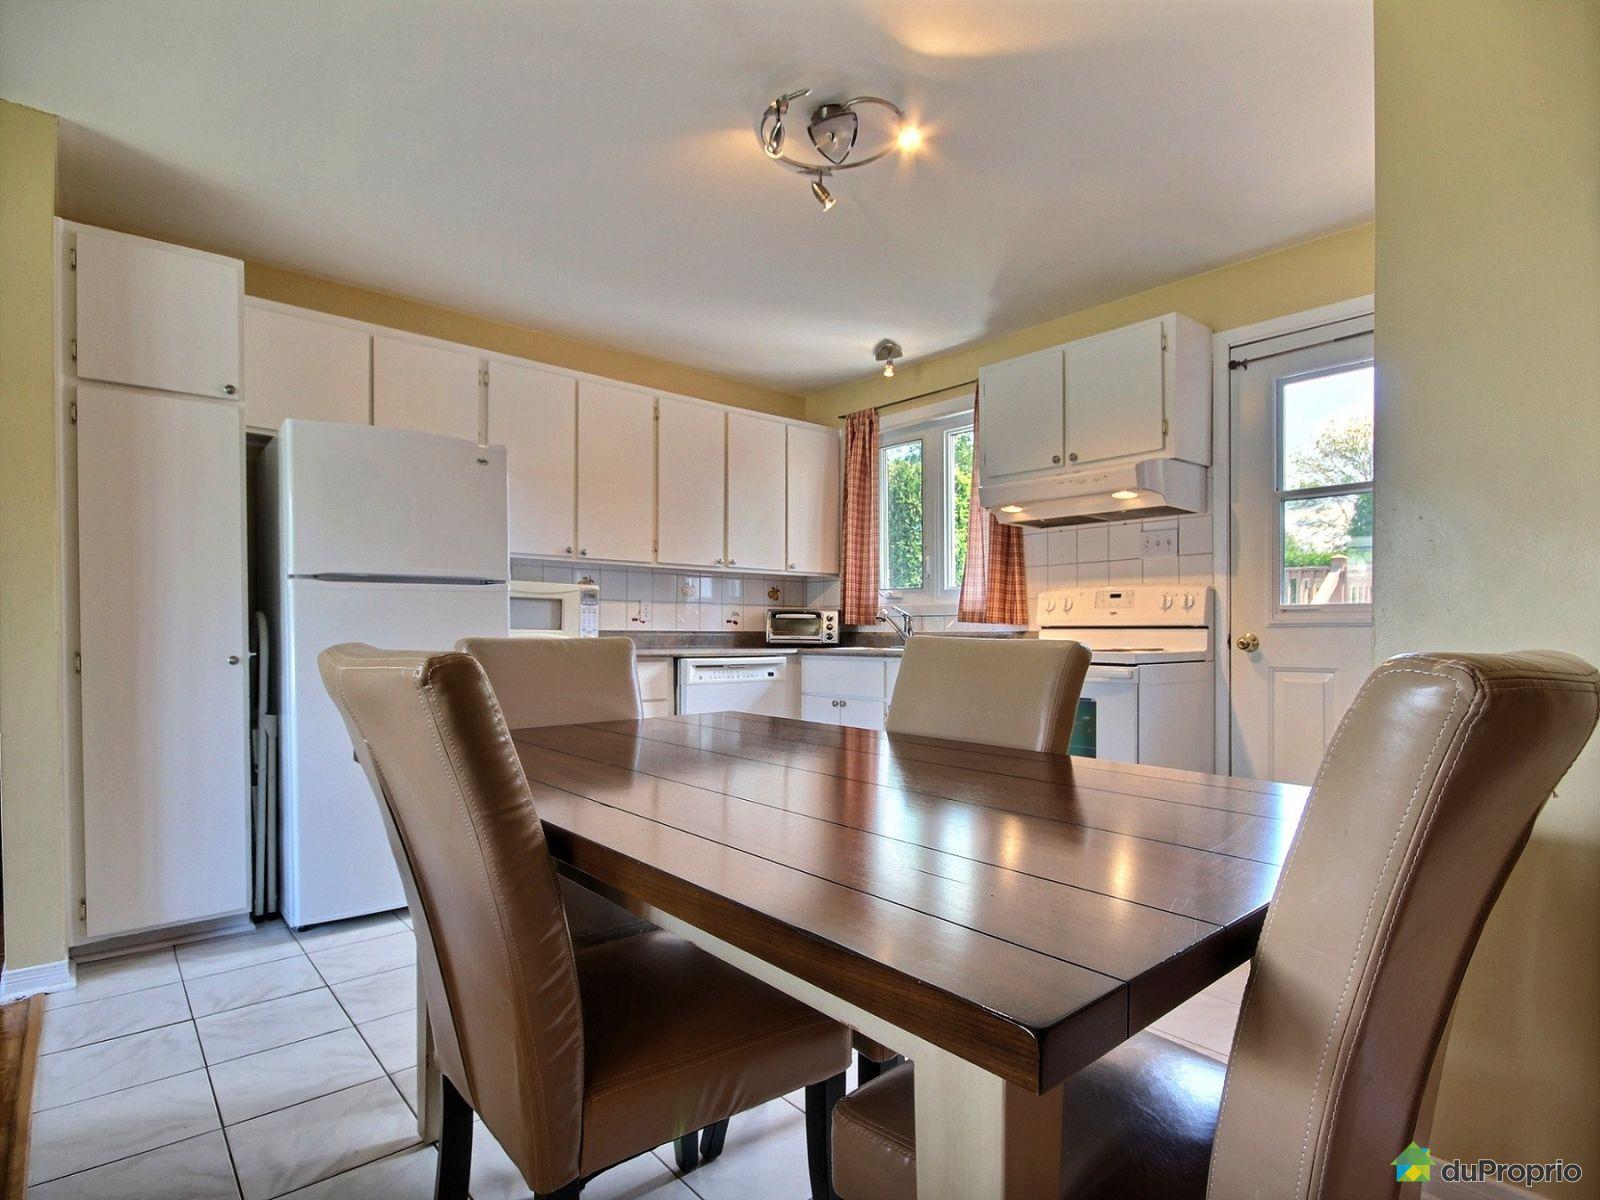 #35241A Maison Vendu Greenfield Park Immobilier Québec  3891 salle a manger pas cher montreal 1600x1200 px @ aertt.com